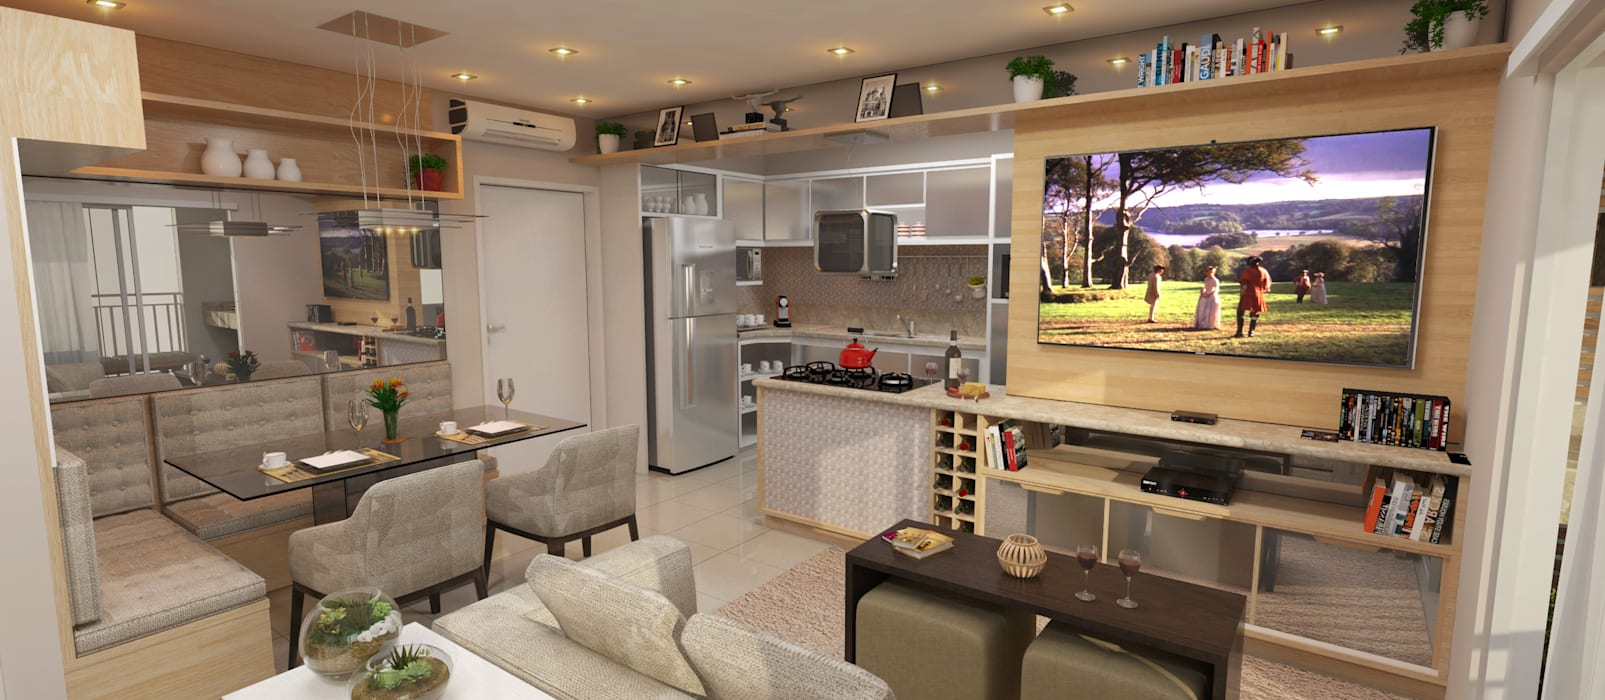 Sotto Mayor Arquitetura e Urbanismo Modern living room Wood-Plastic Composite Beige